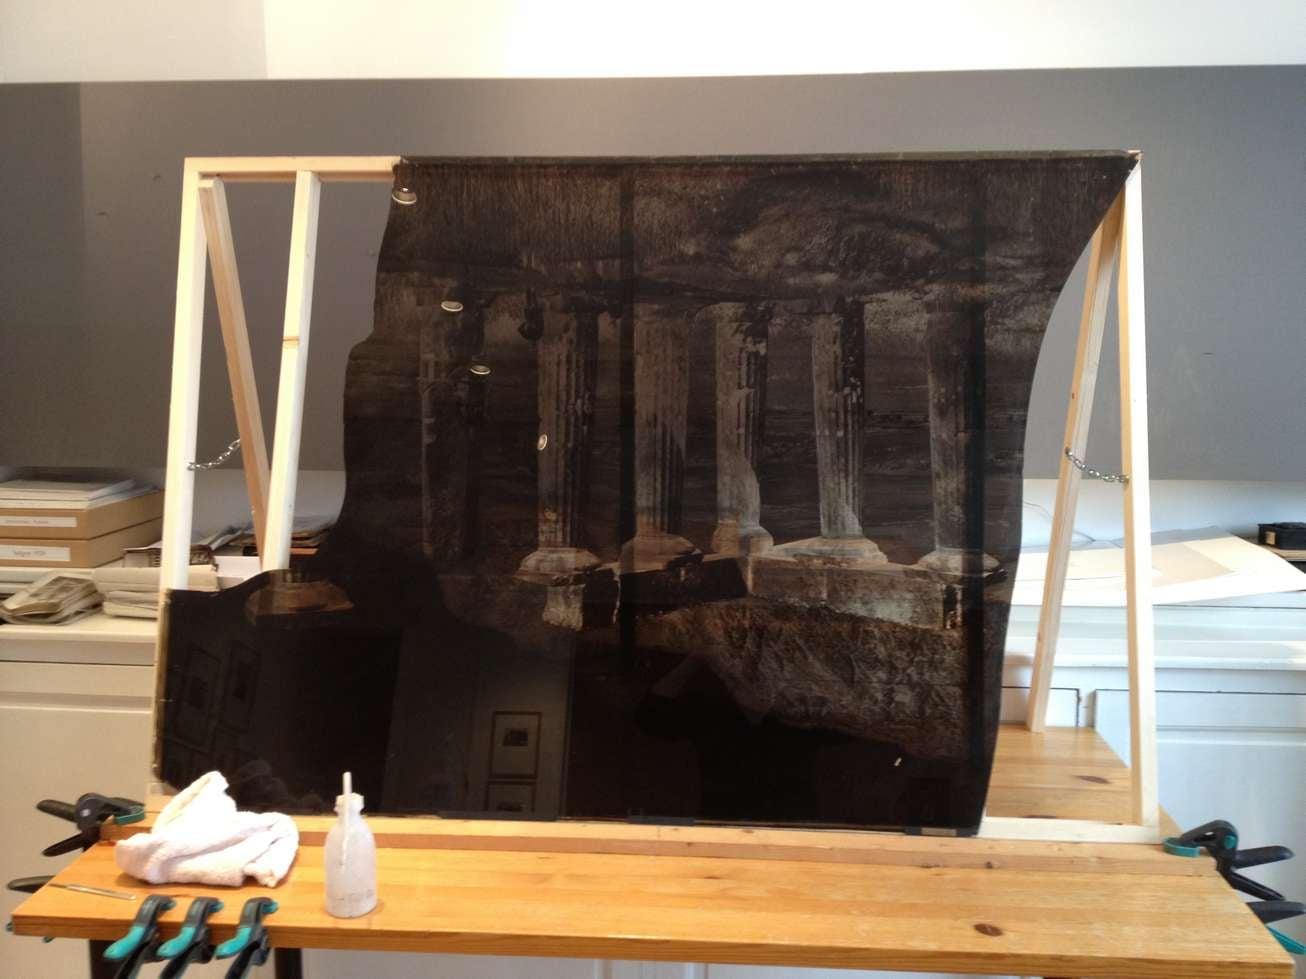 plaque-photo-verre-gelatine-ruines-grecques-negatif_galerie-lumieres-des-roses-art-restauration-reparation-restaurarte.jpg